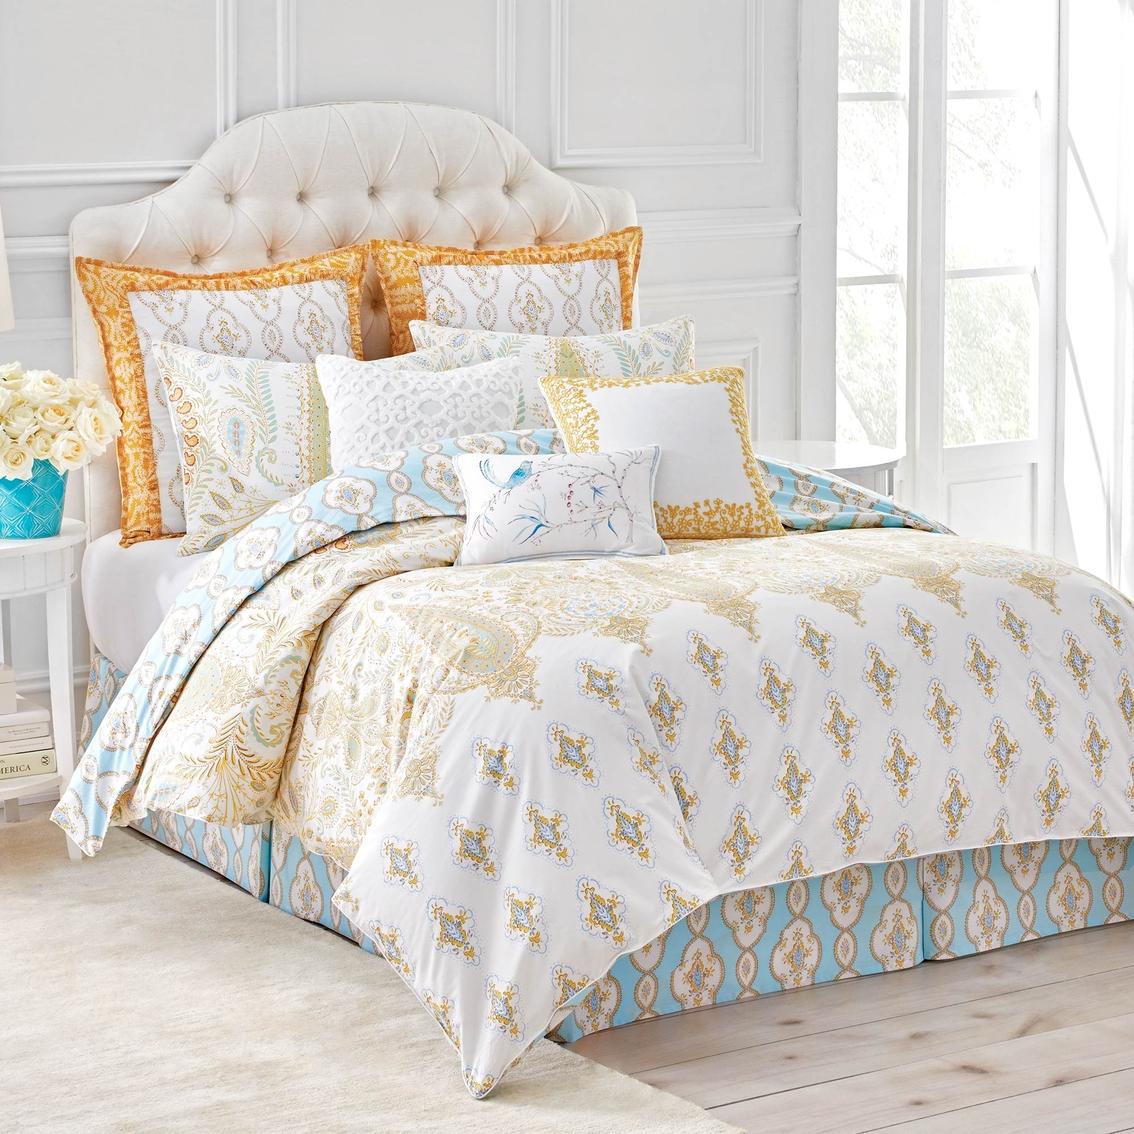 Dena Bedding Dena Home Dream Comforter Set Bedding